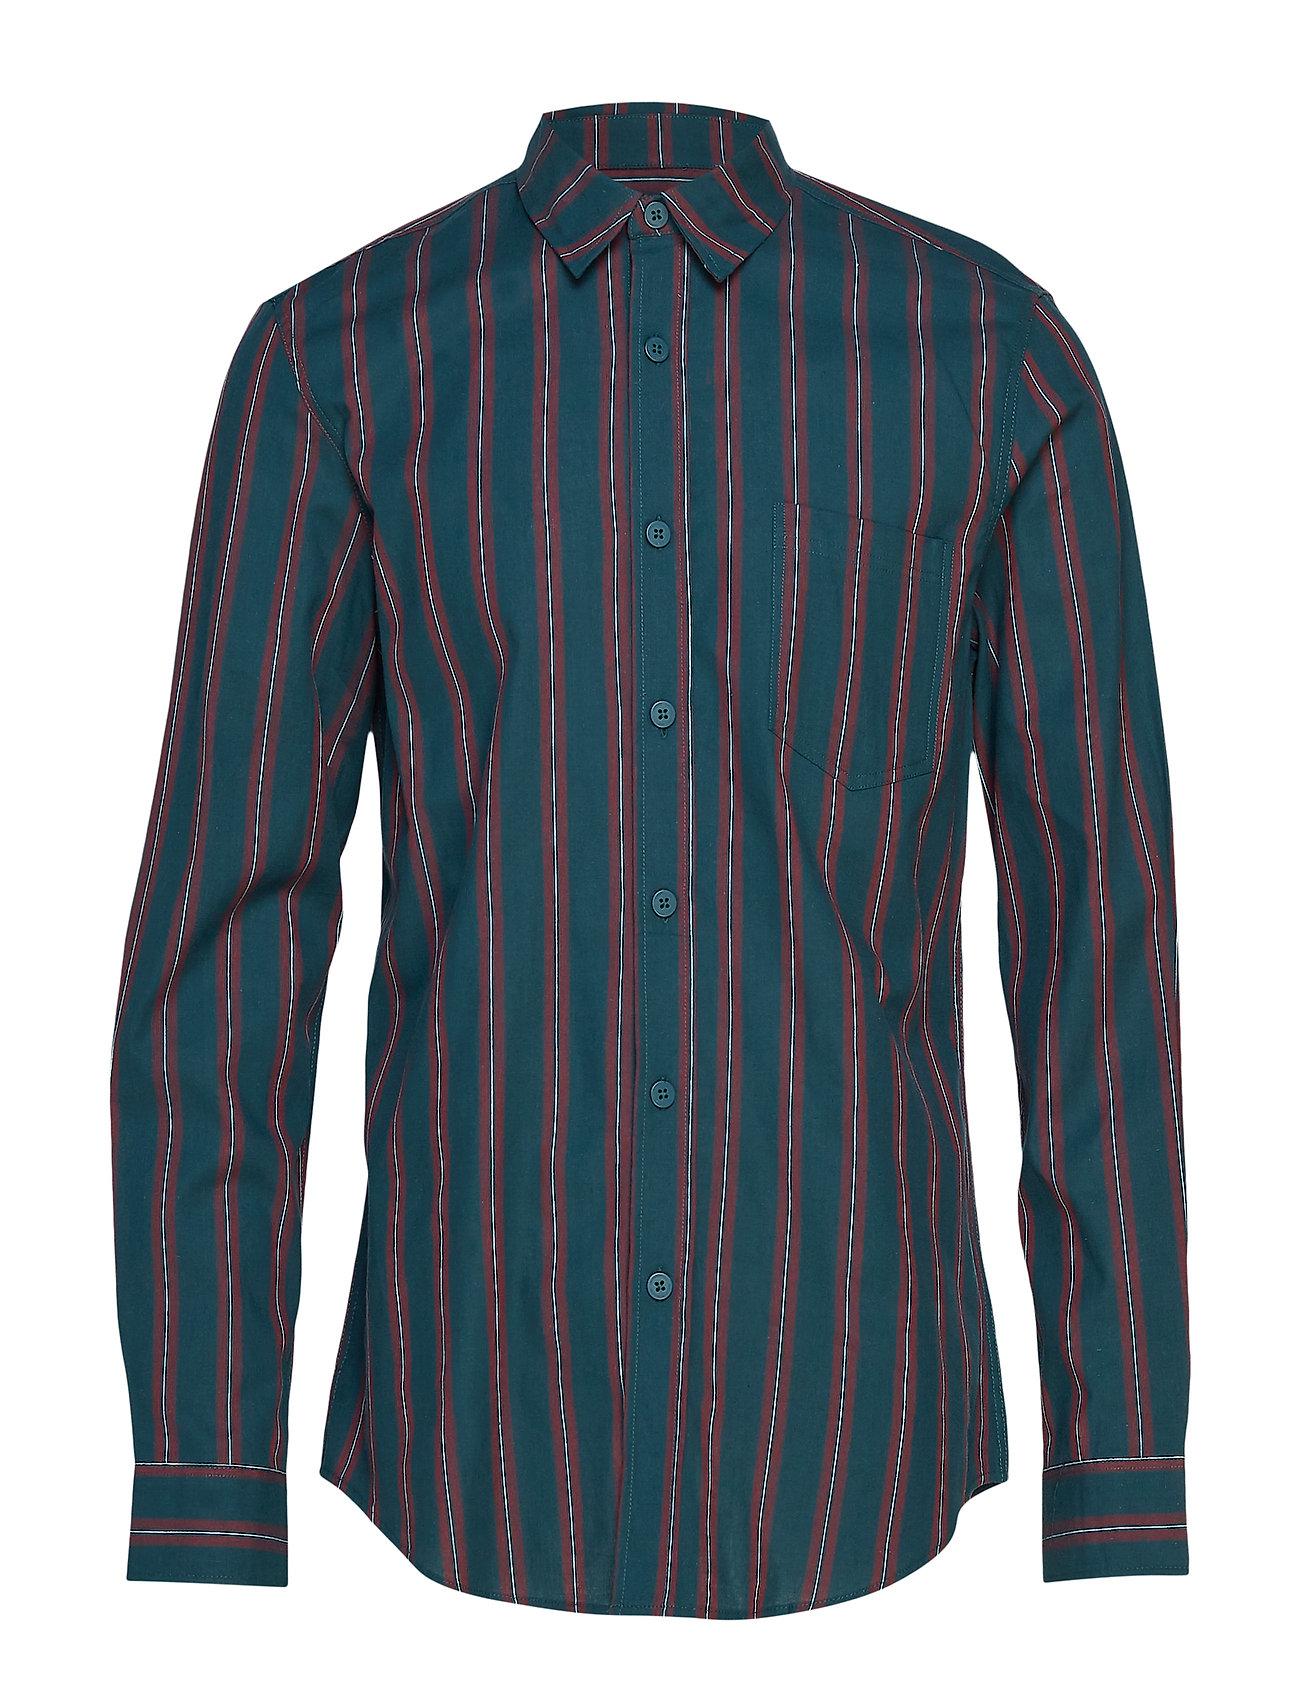 HAN Kjøbenhavn One Pocket Shirt - GREEN STRIPE